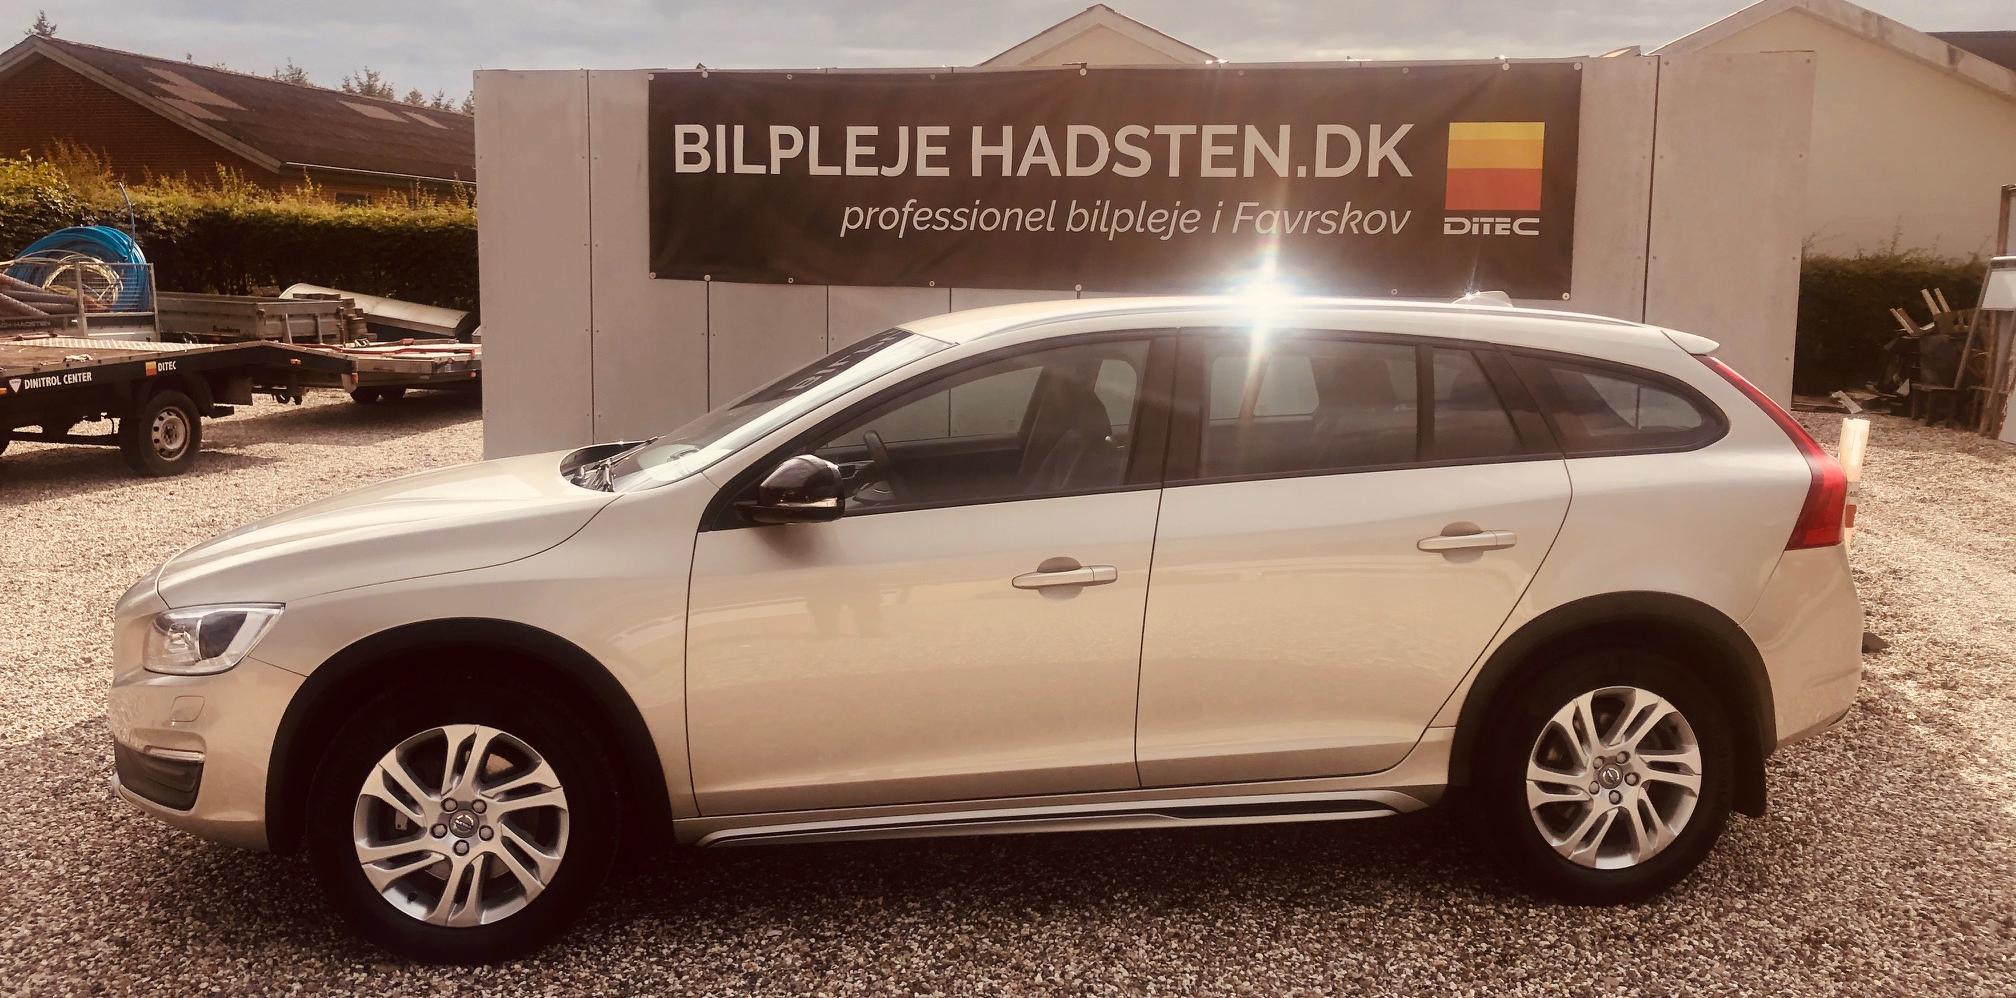 Volvo V60 Cross Country Ditec Ceramic Ultra behandlet hos Bilpleje Hadsten